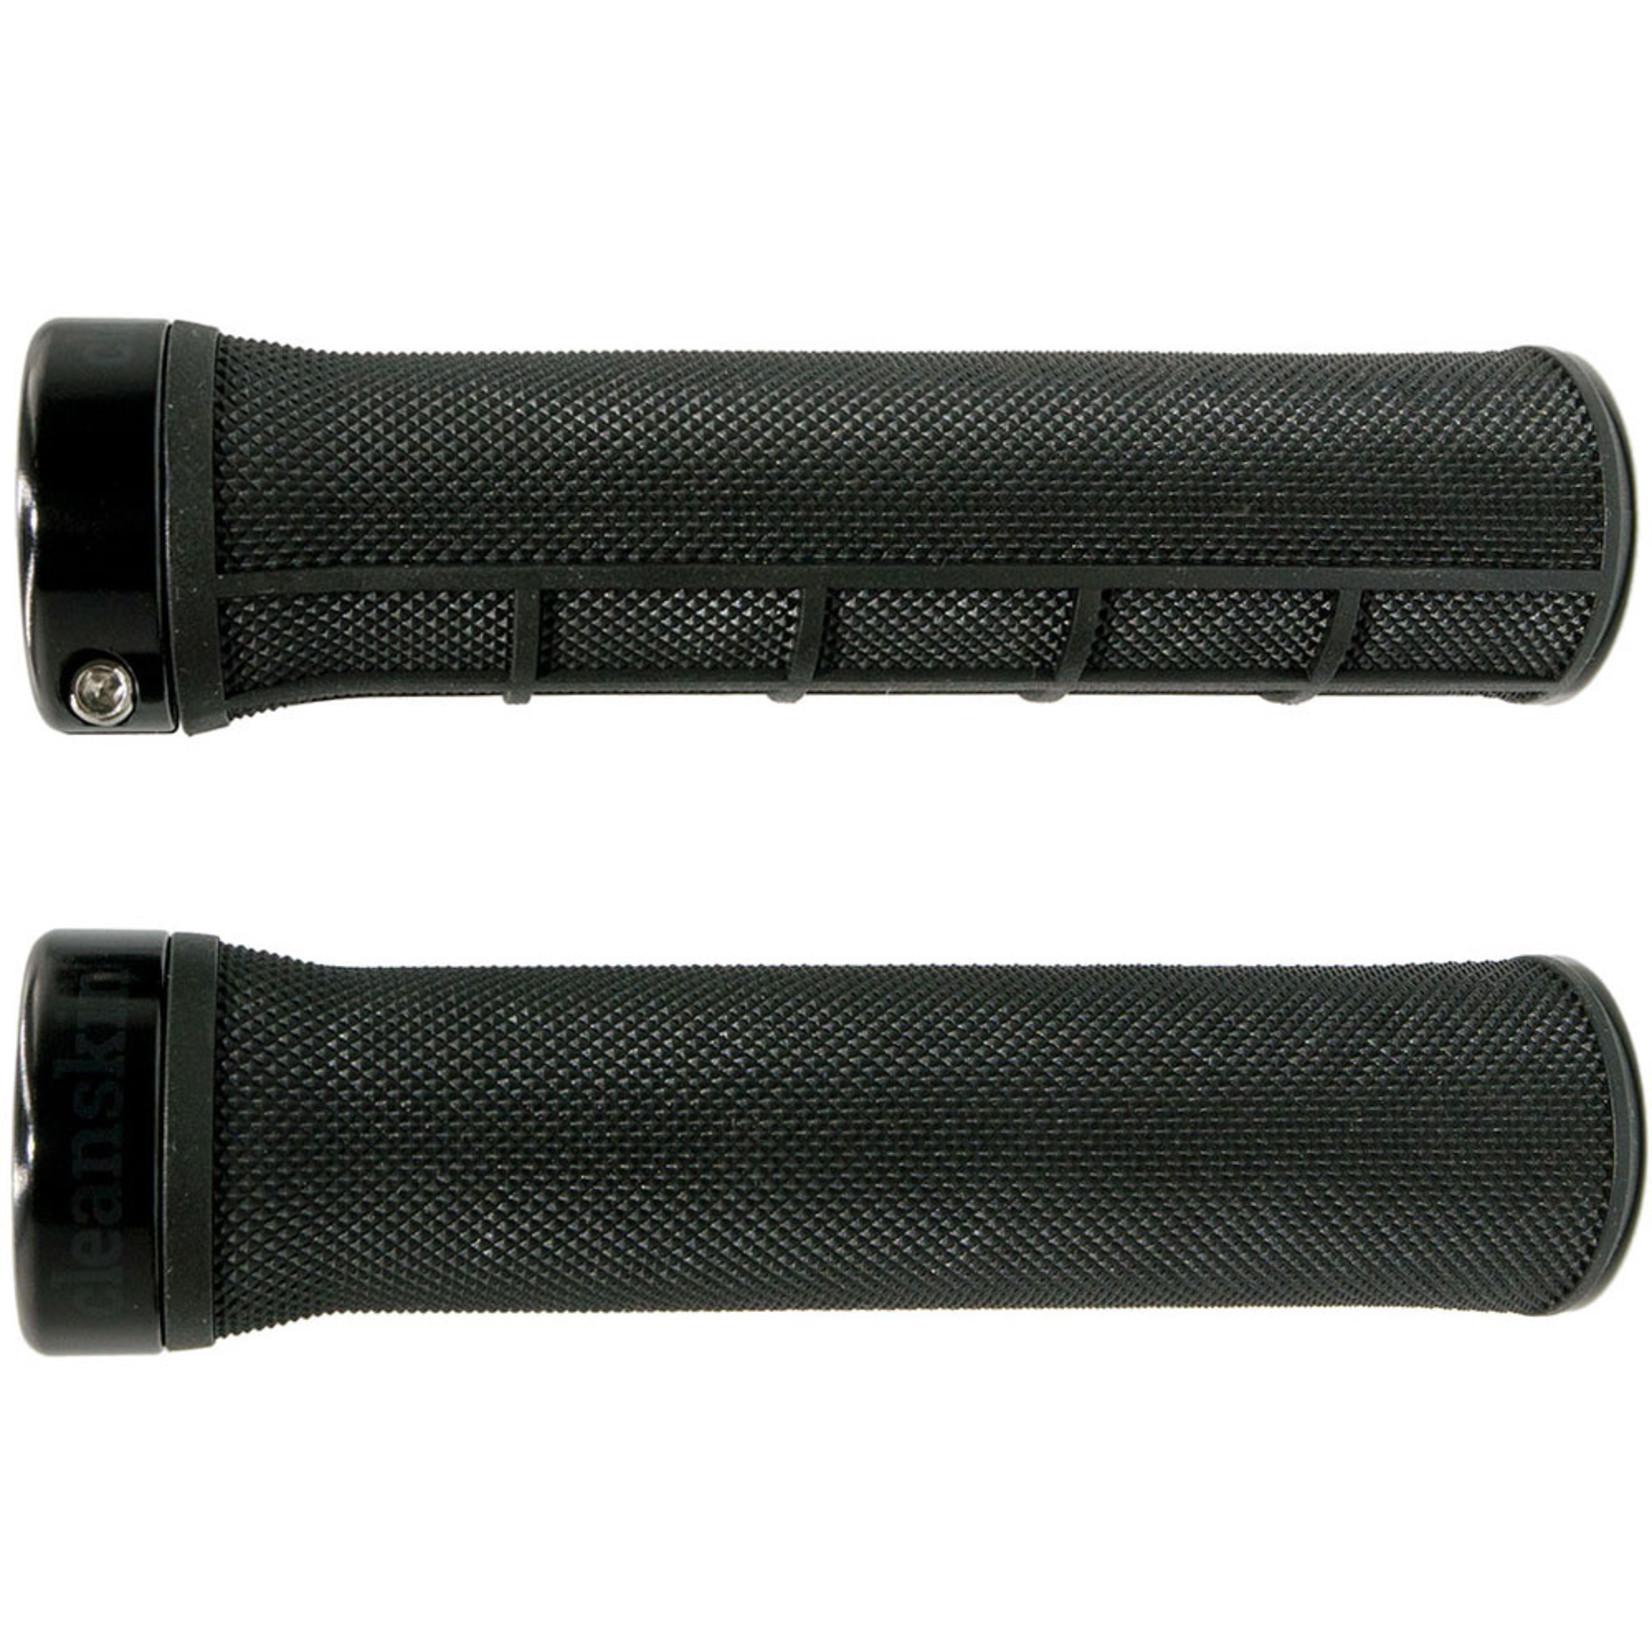 Cleanskin Cleanskin, Flow Single Clamp Lock-On Grips Black